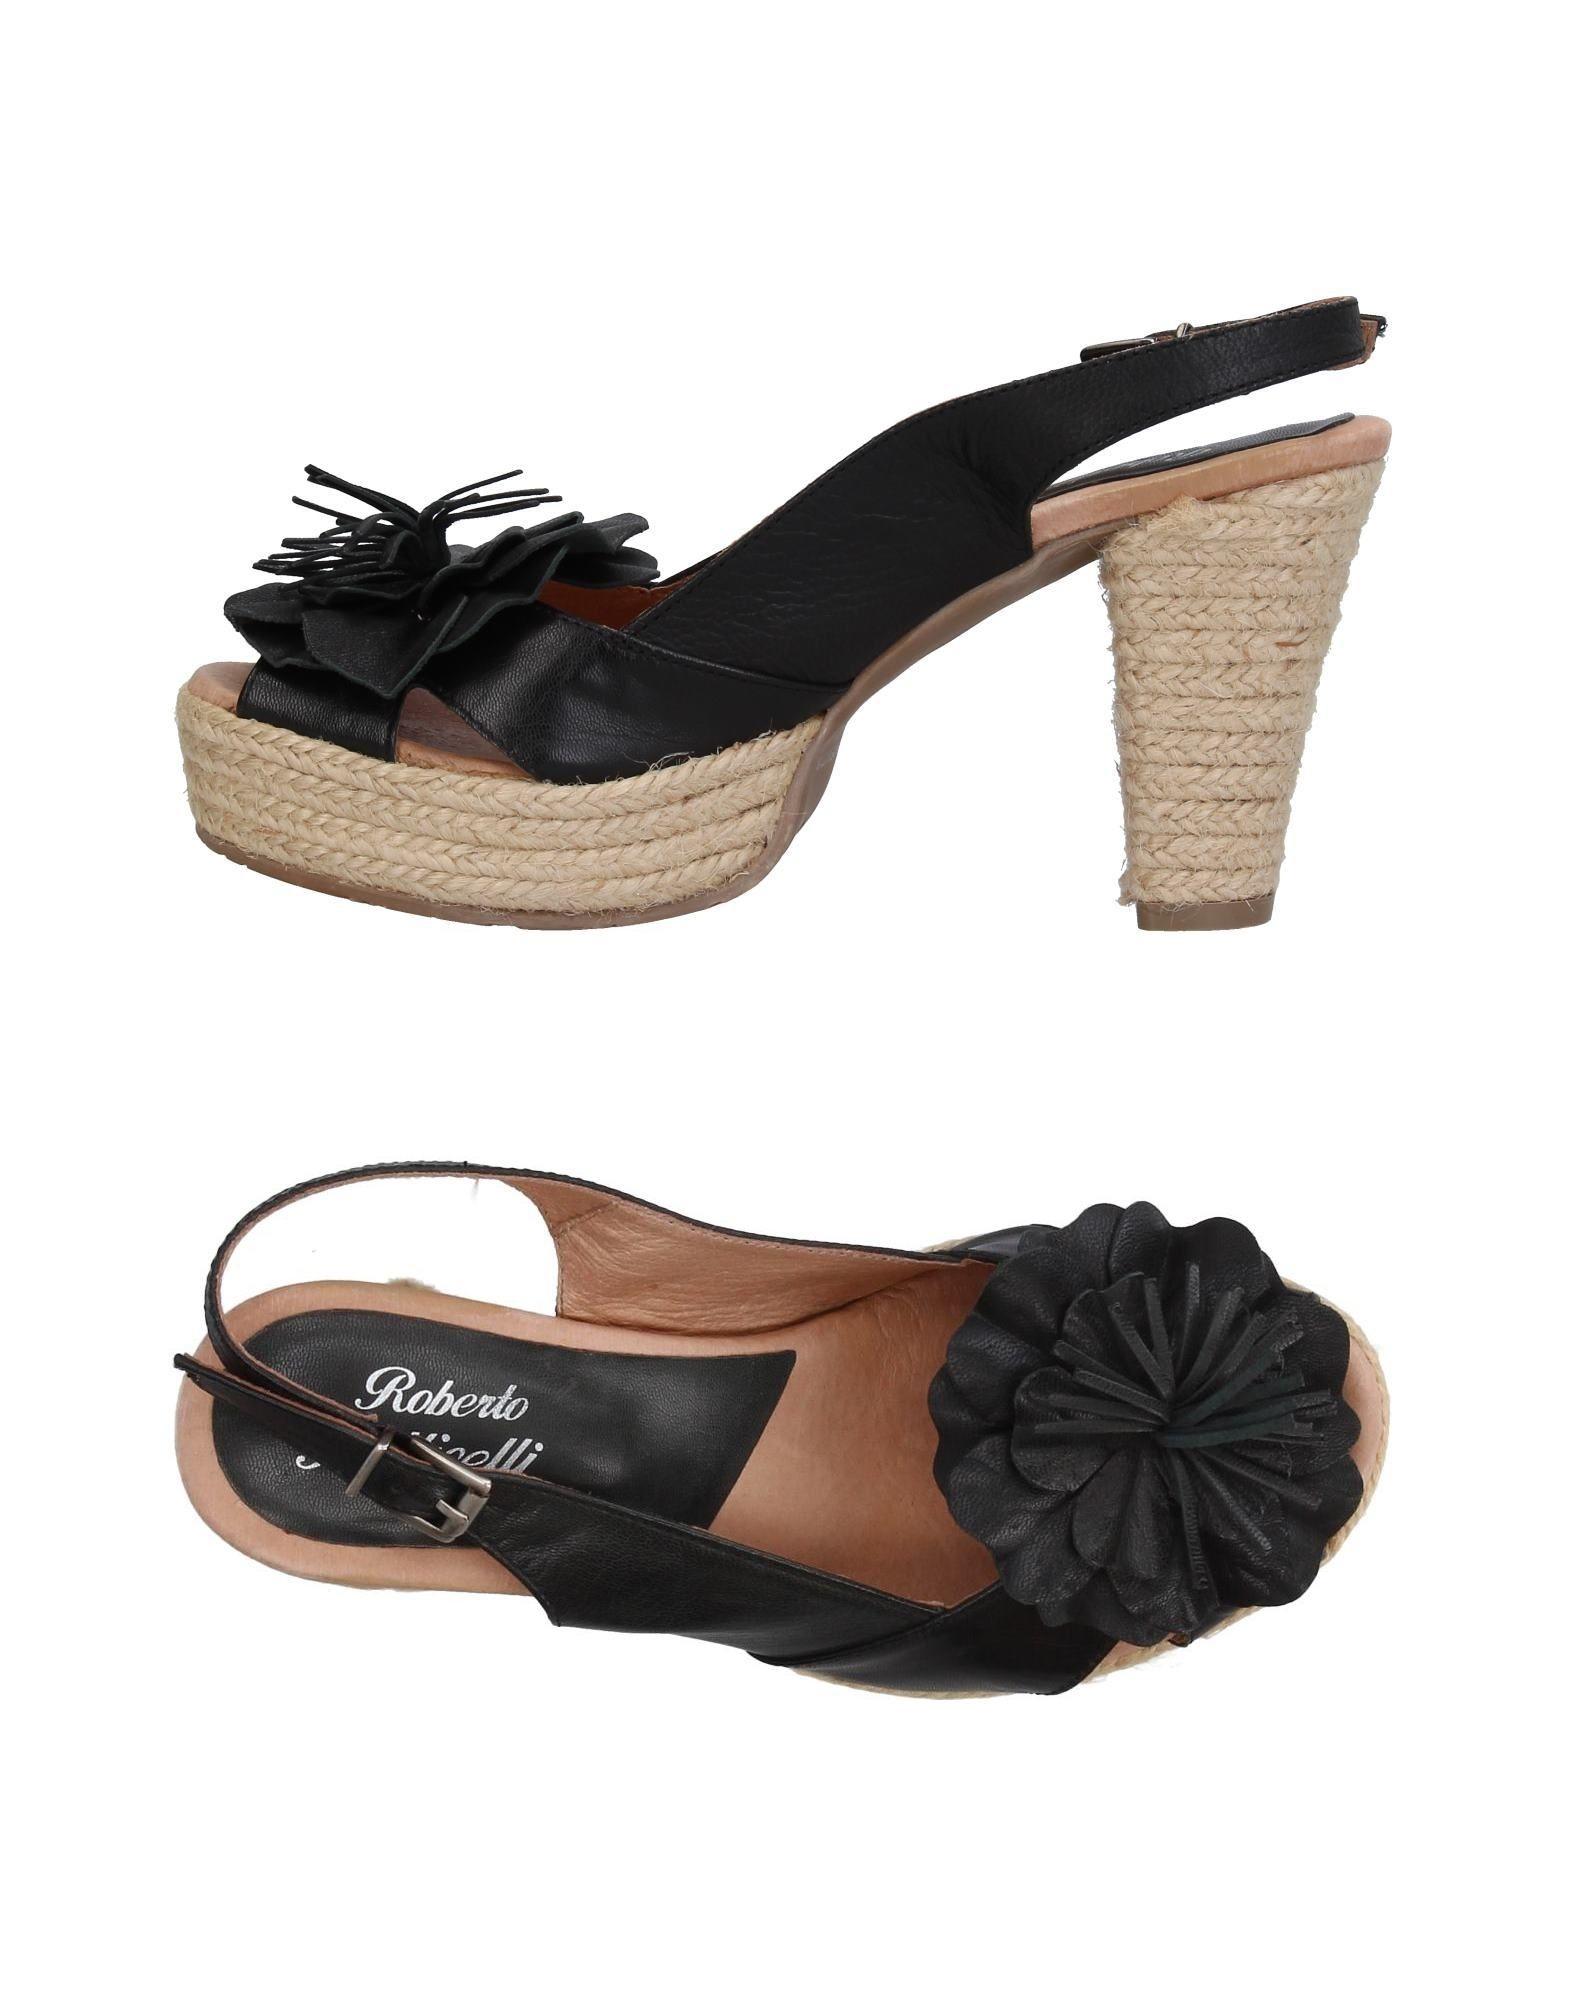 Chaussures - Sandales Roberto Botticelli 9aDhP